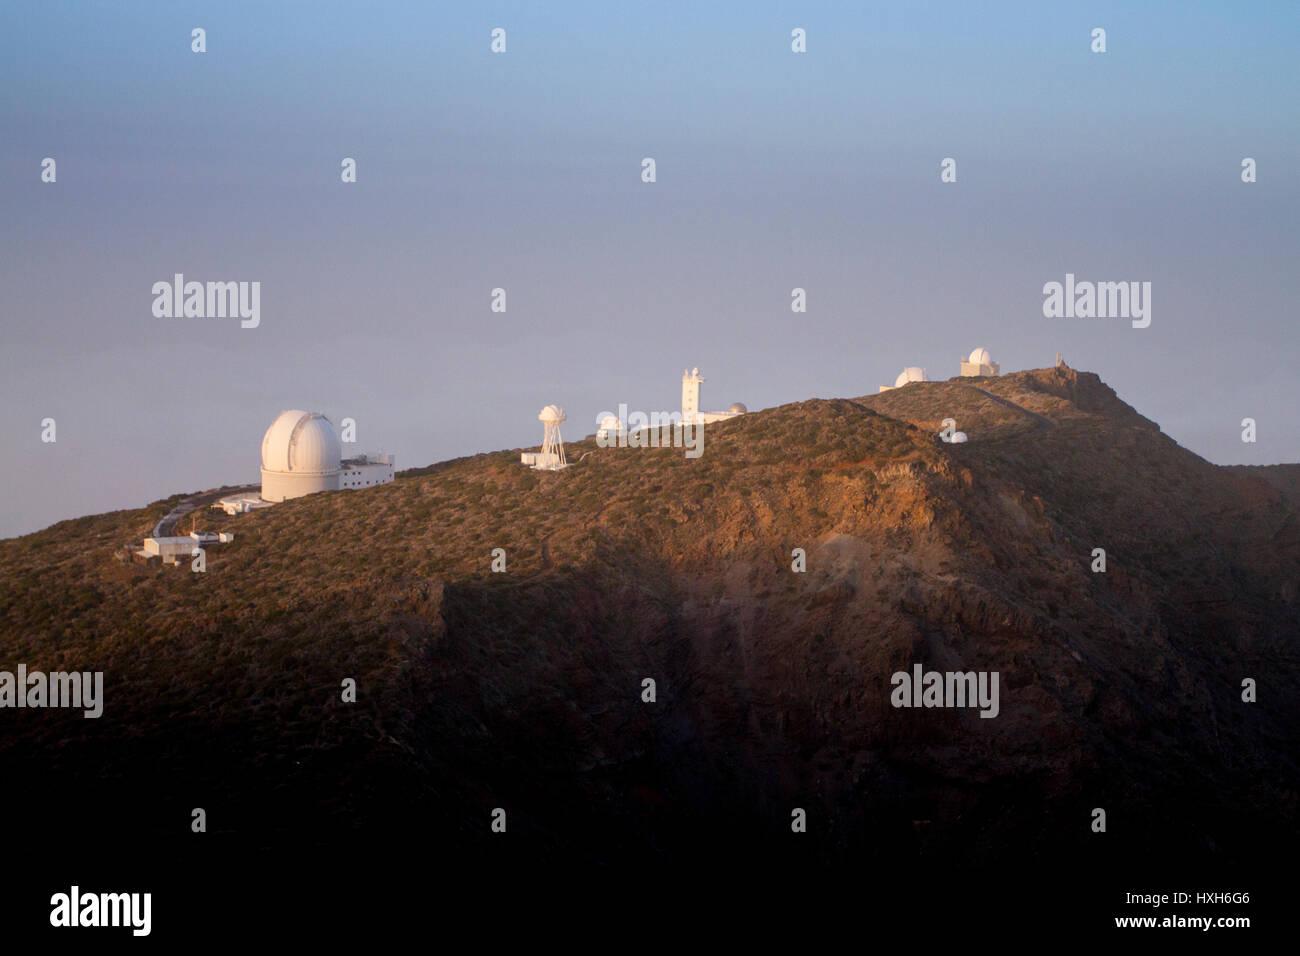 Observatory of La Palma, Canary Islands - Stock Image